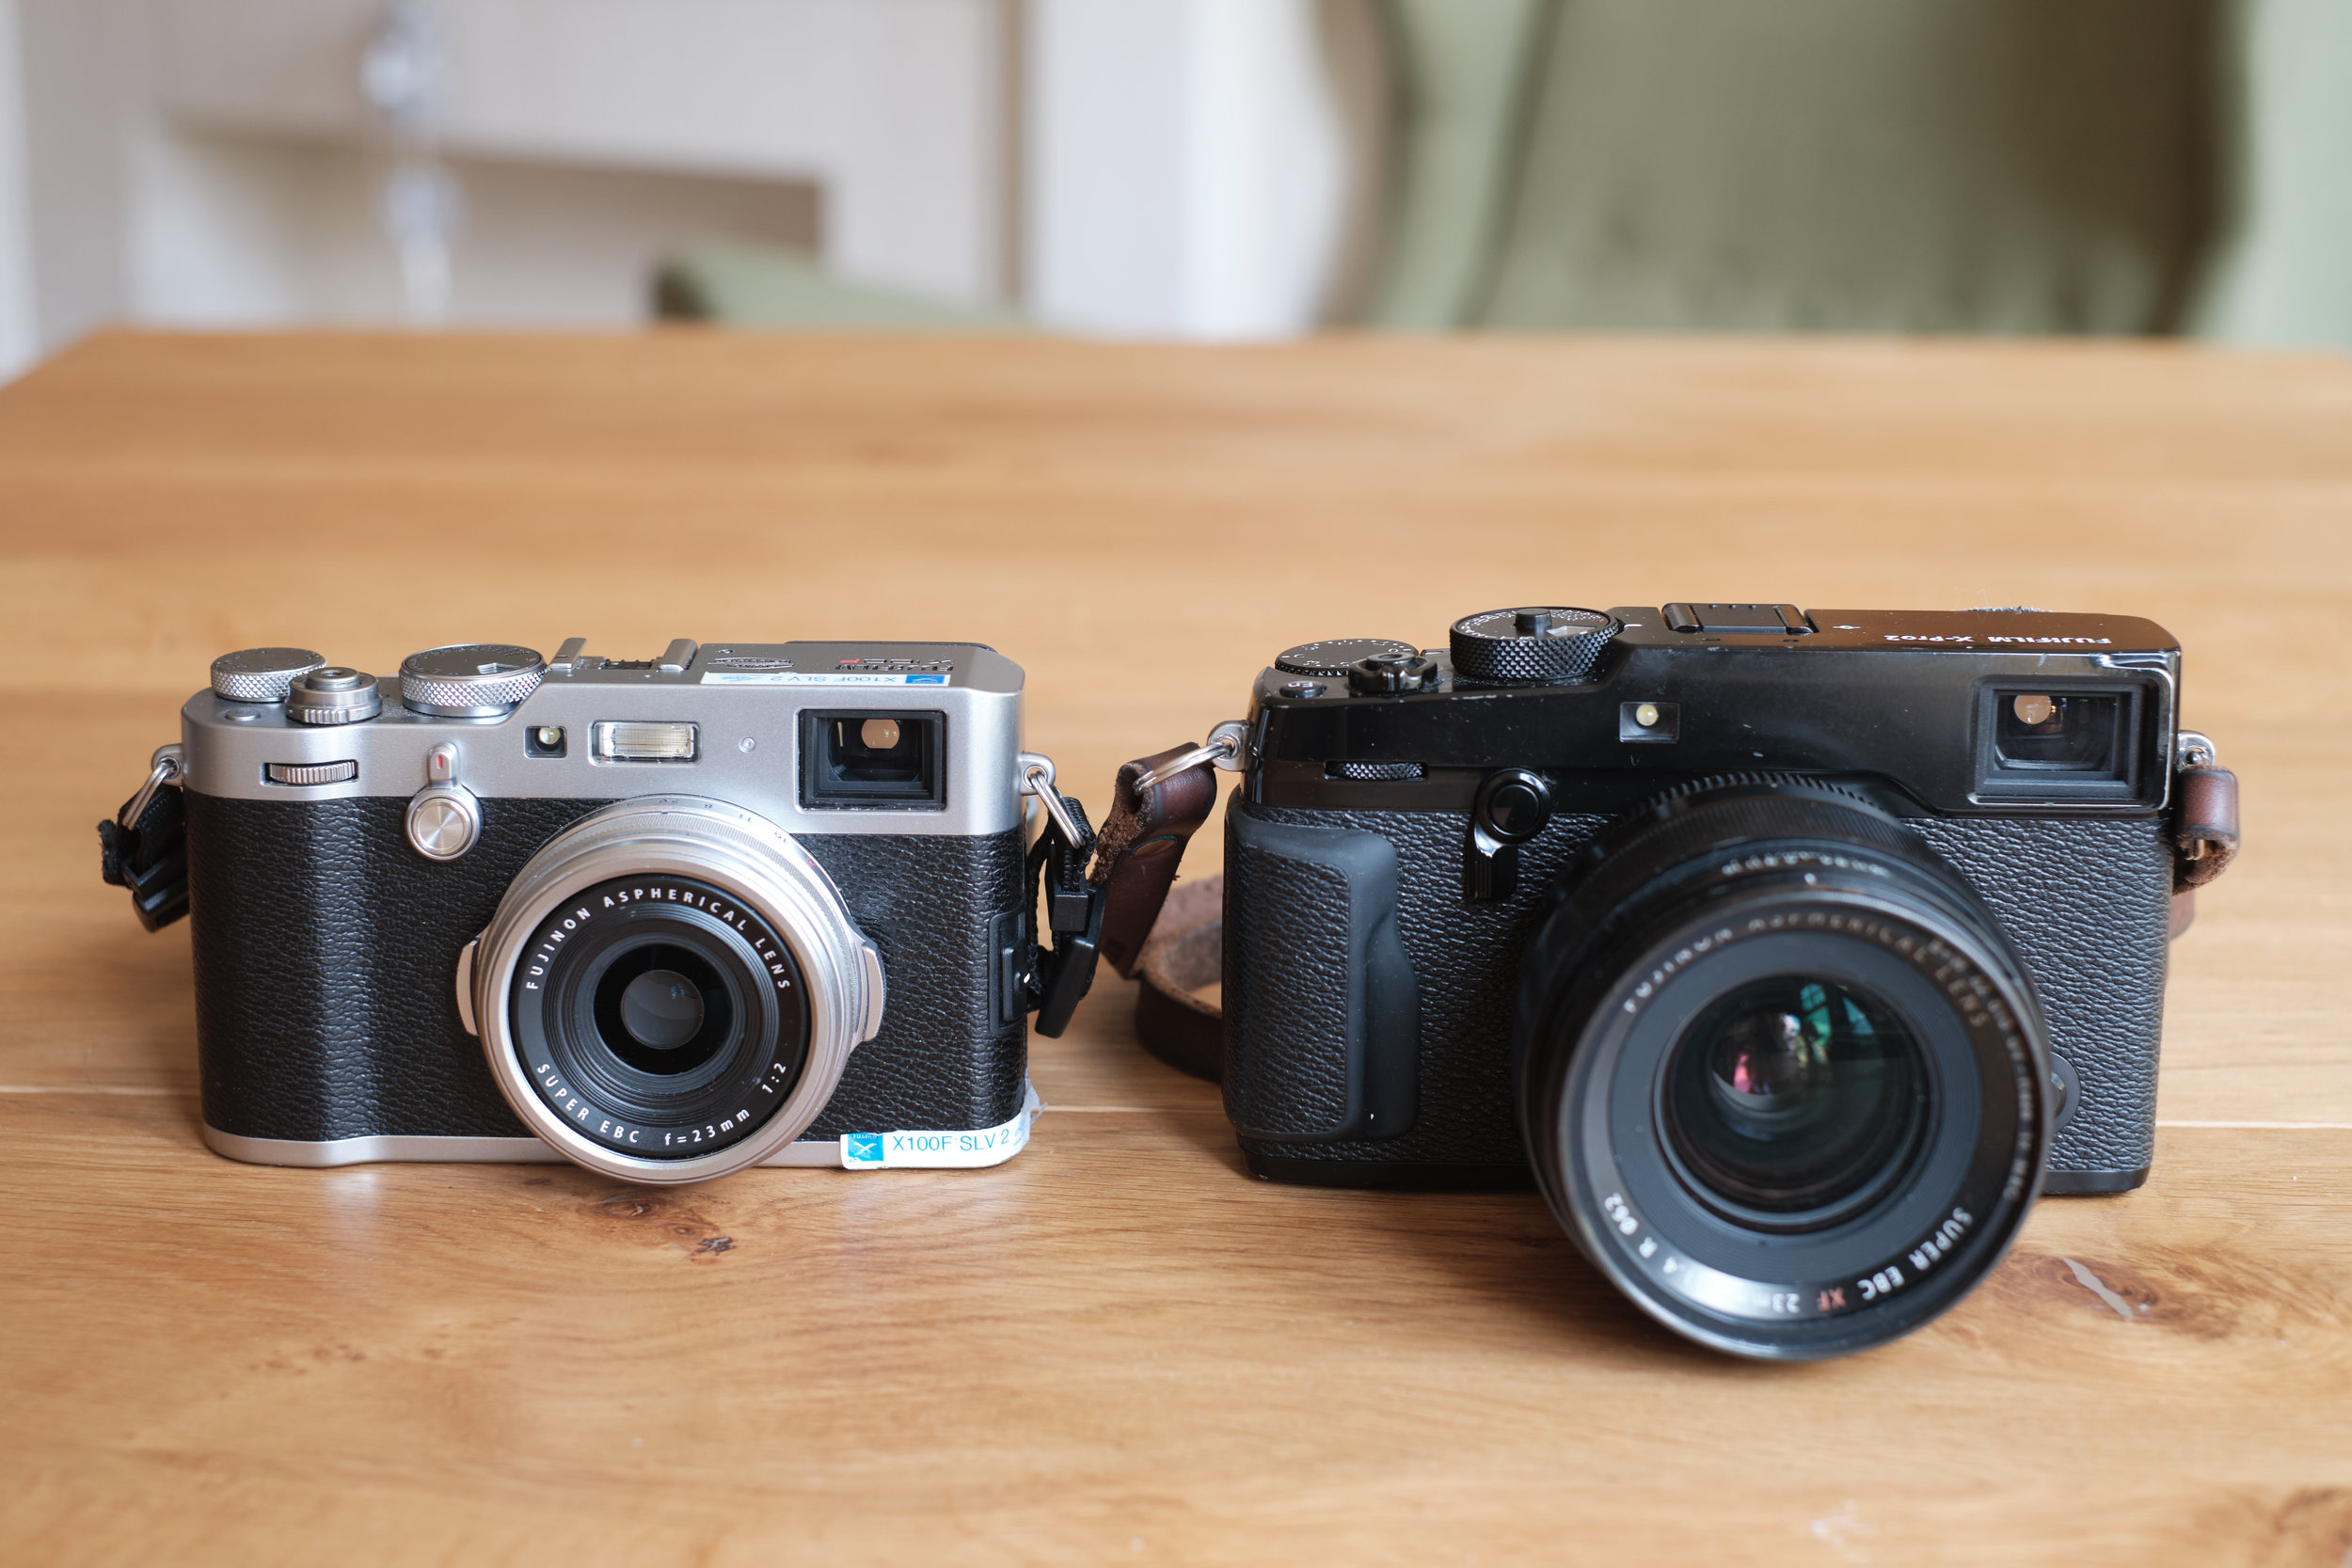 Fujifilm X-Pro2 with an XF 23mm f/1.4 R and Fujifilm X 100F size comparison